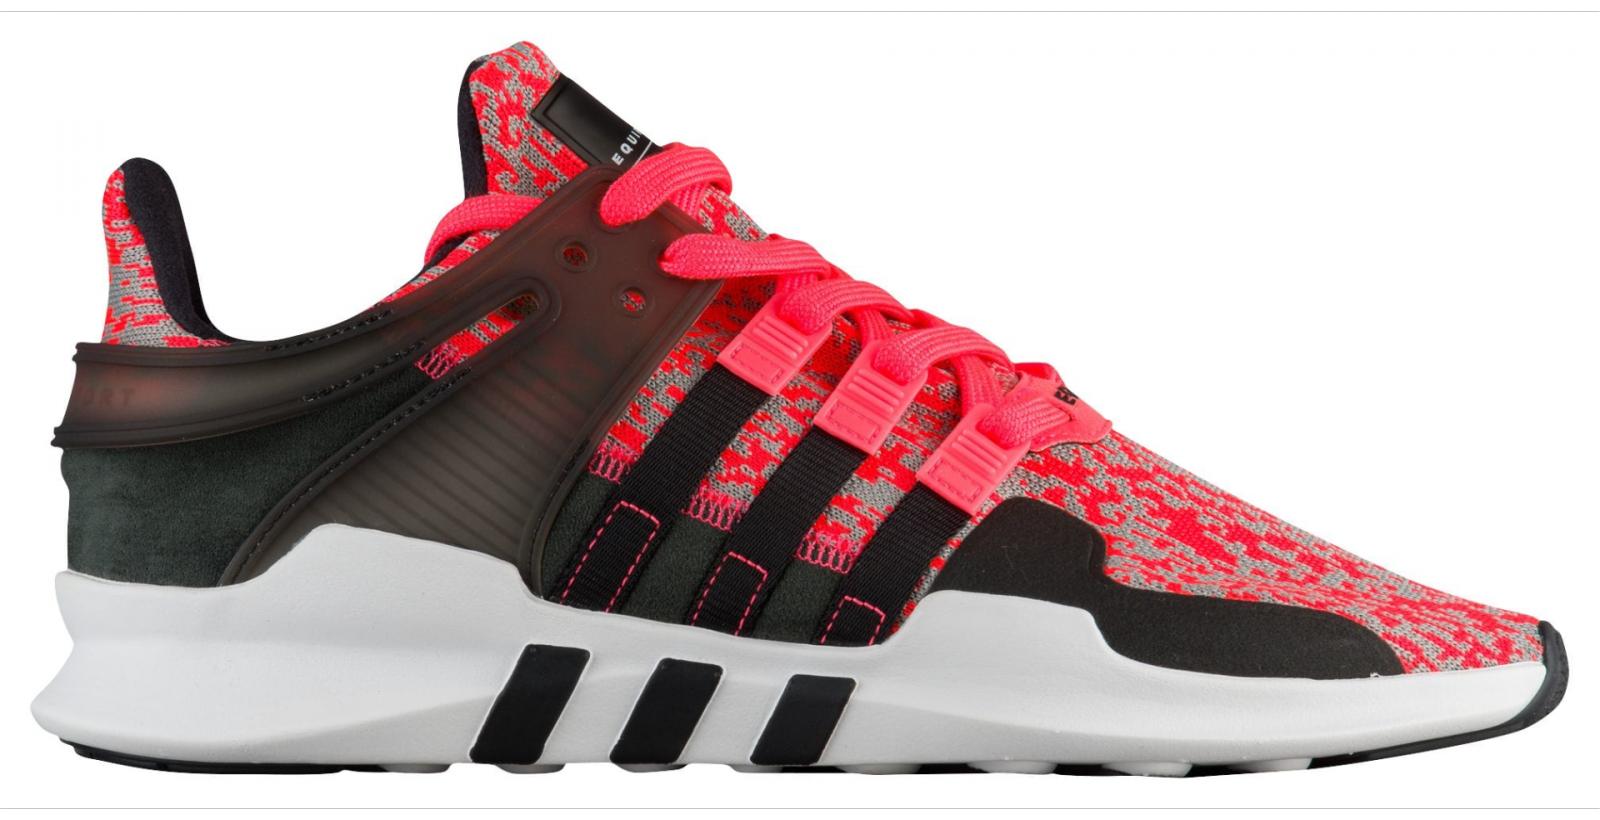 Homme Adidas EQUIPMENT SUPPORT ADV Noir Rose RunningTrainers CG2950